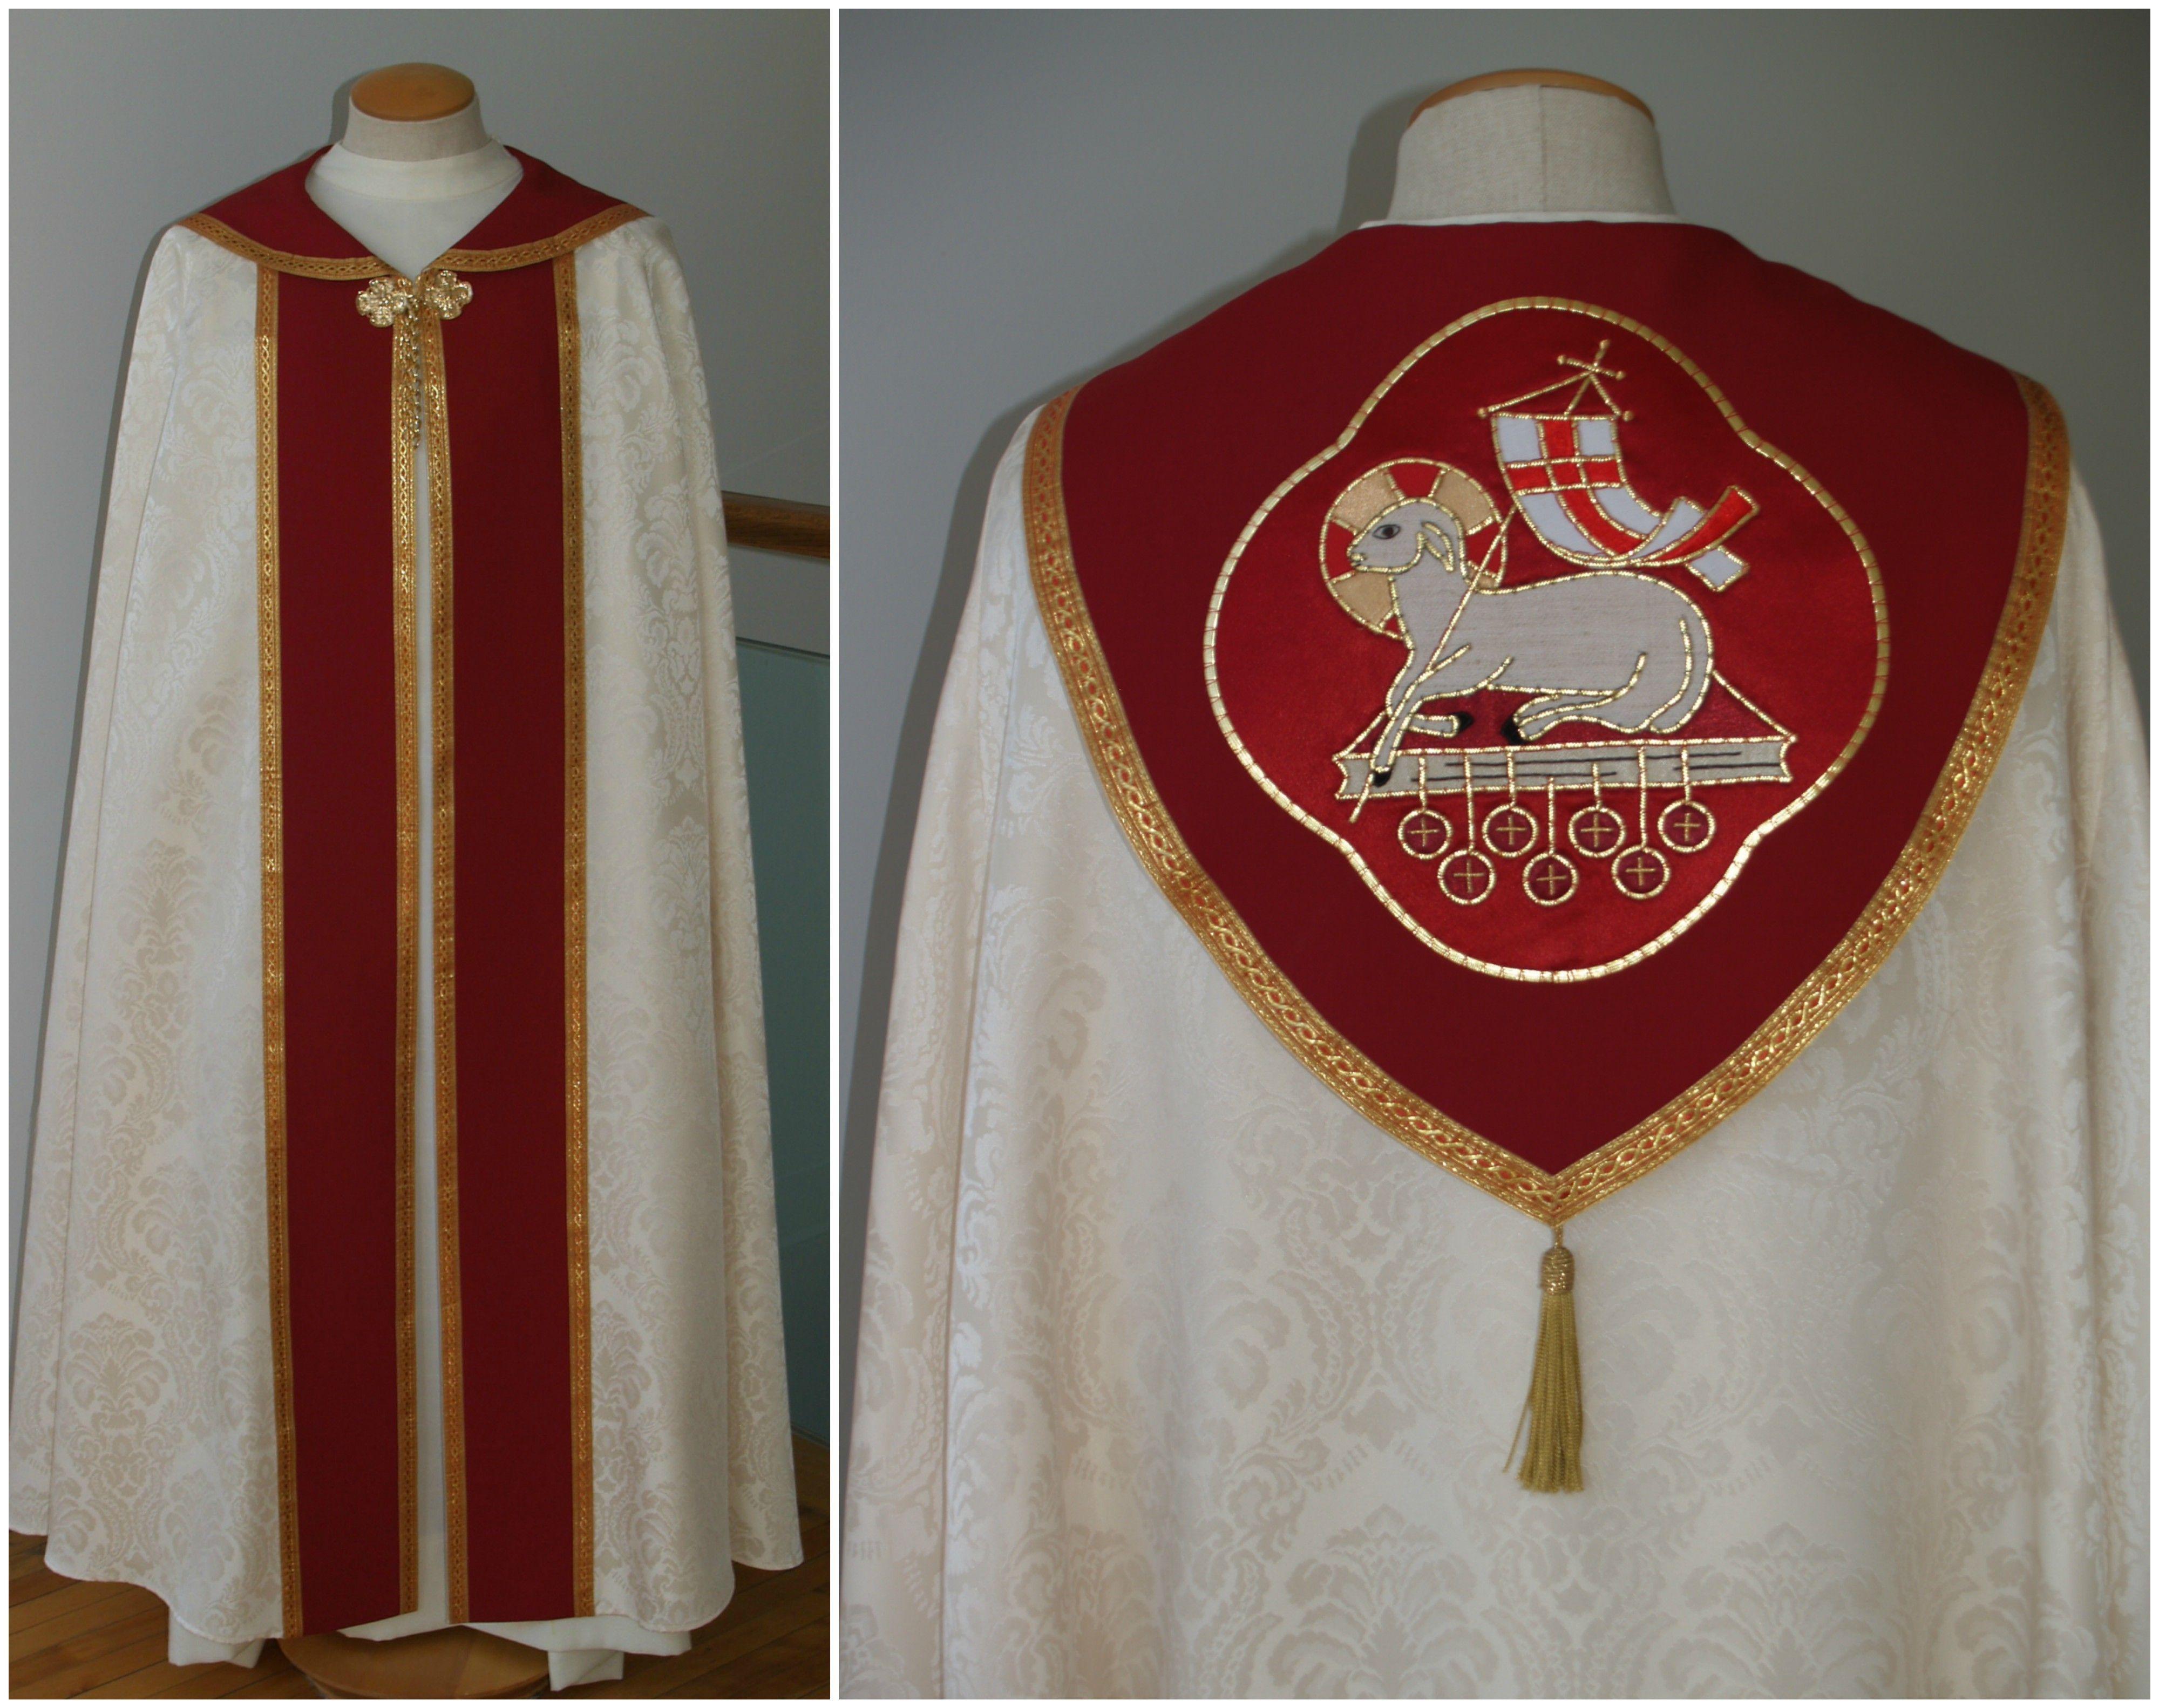 White Red Ihs Lamb Cope Liturgical Seasons Communion Sets Vestment